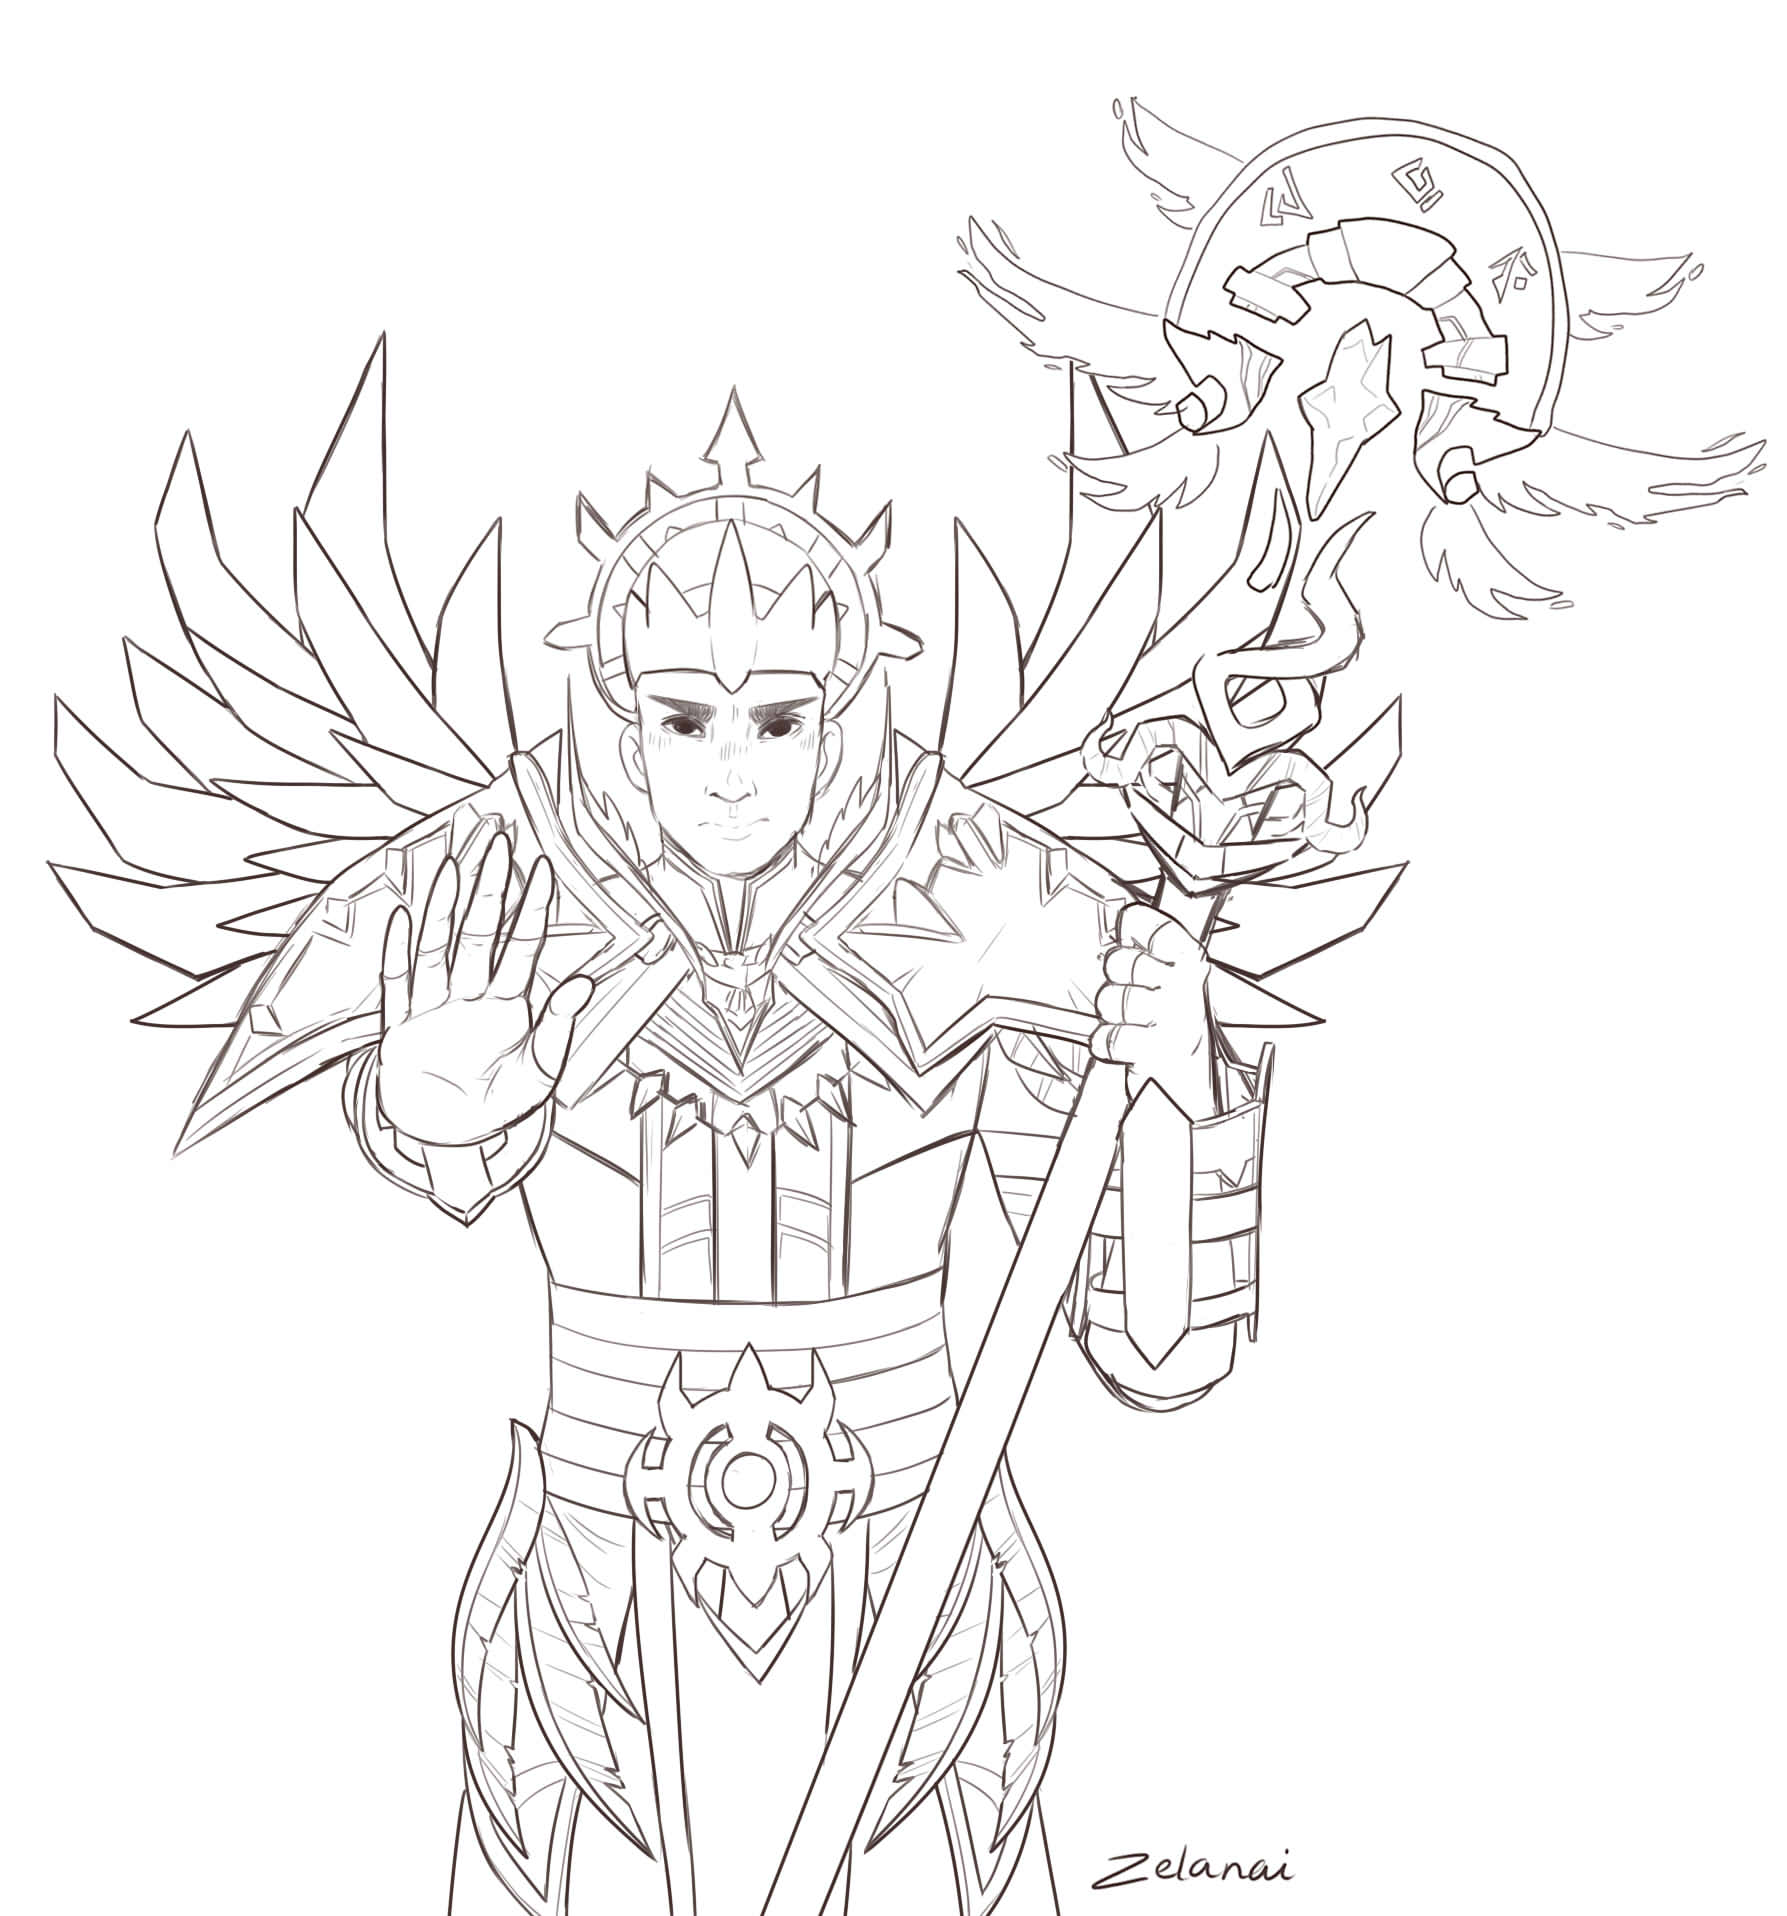 Human priest sketch (character belonging to @_keshi_ on